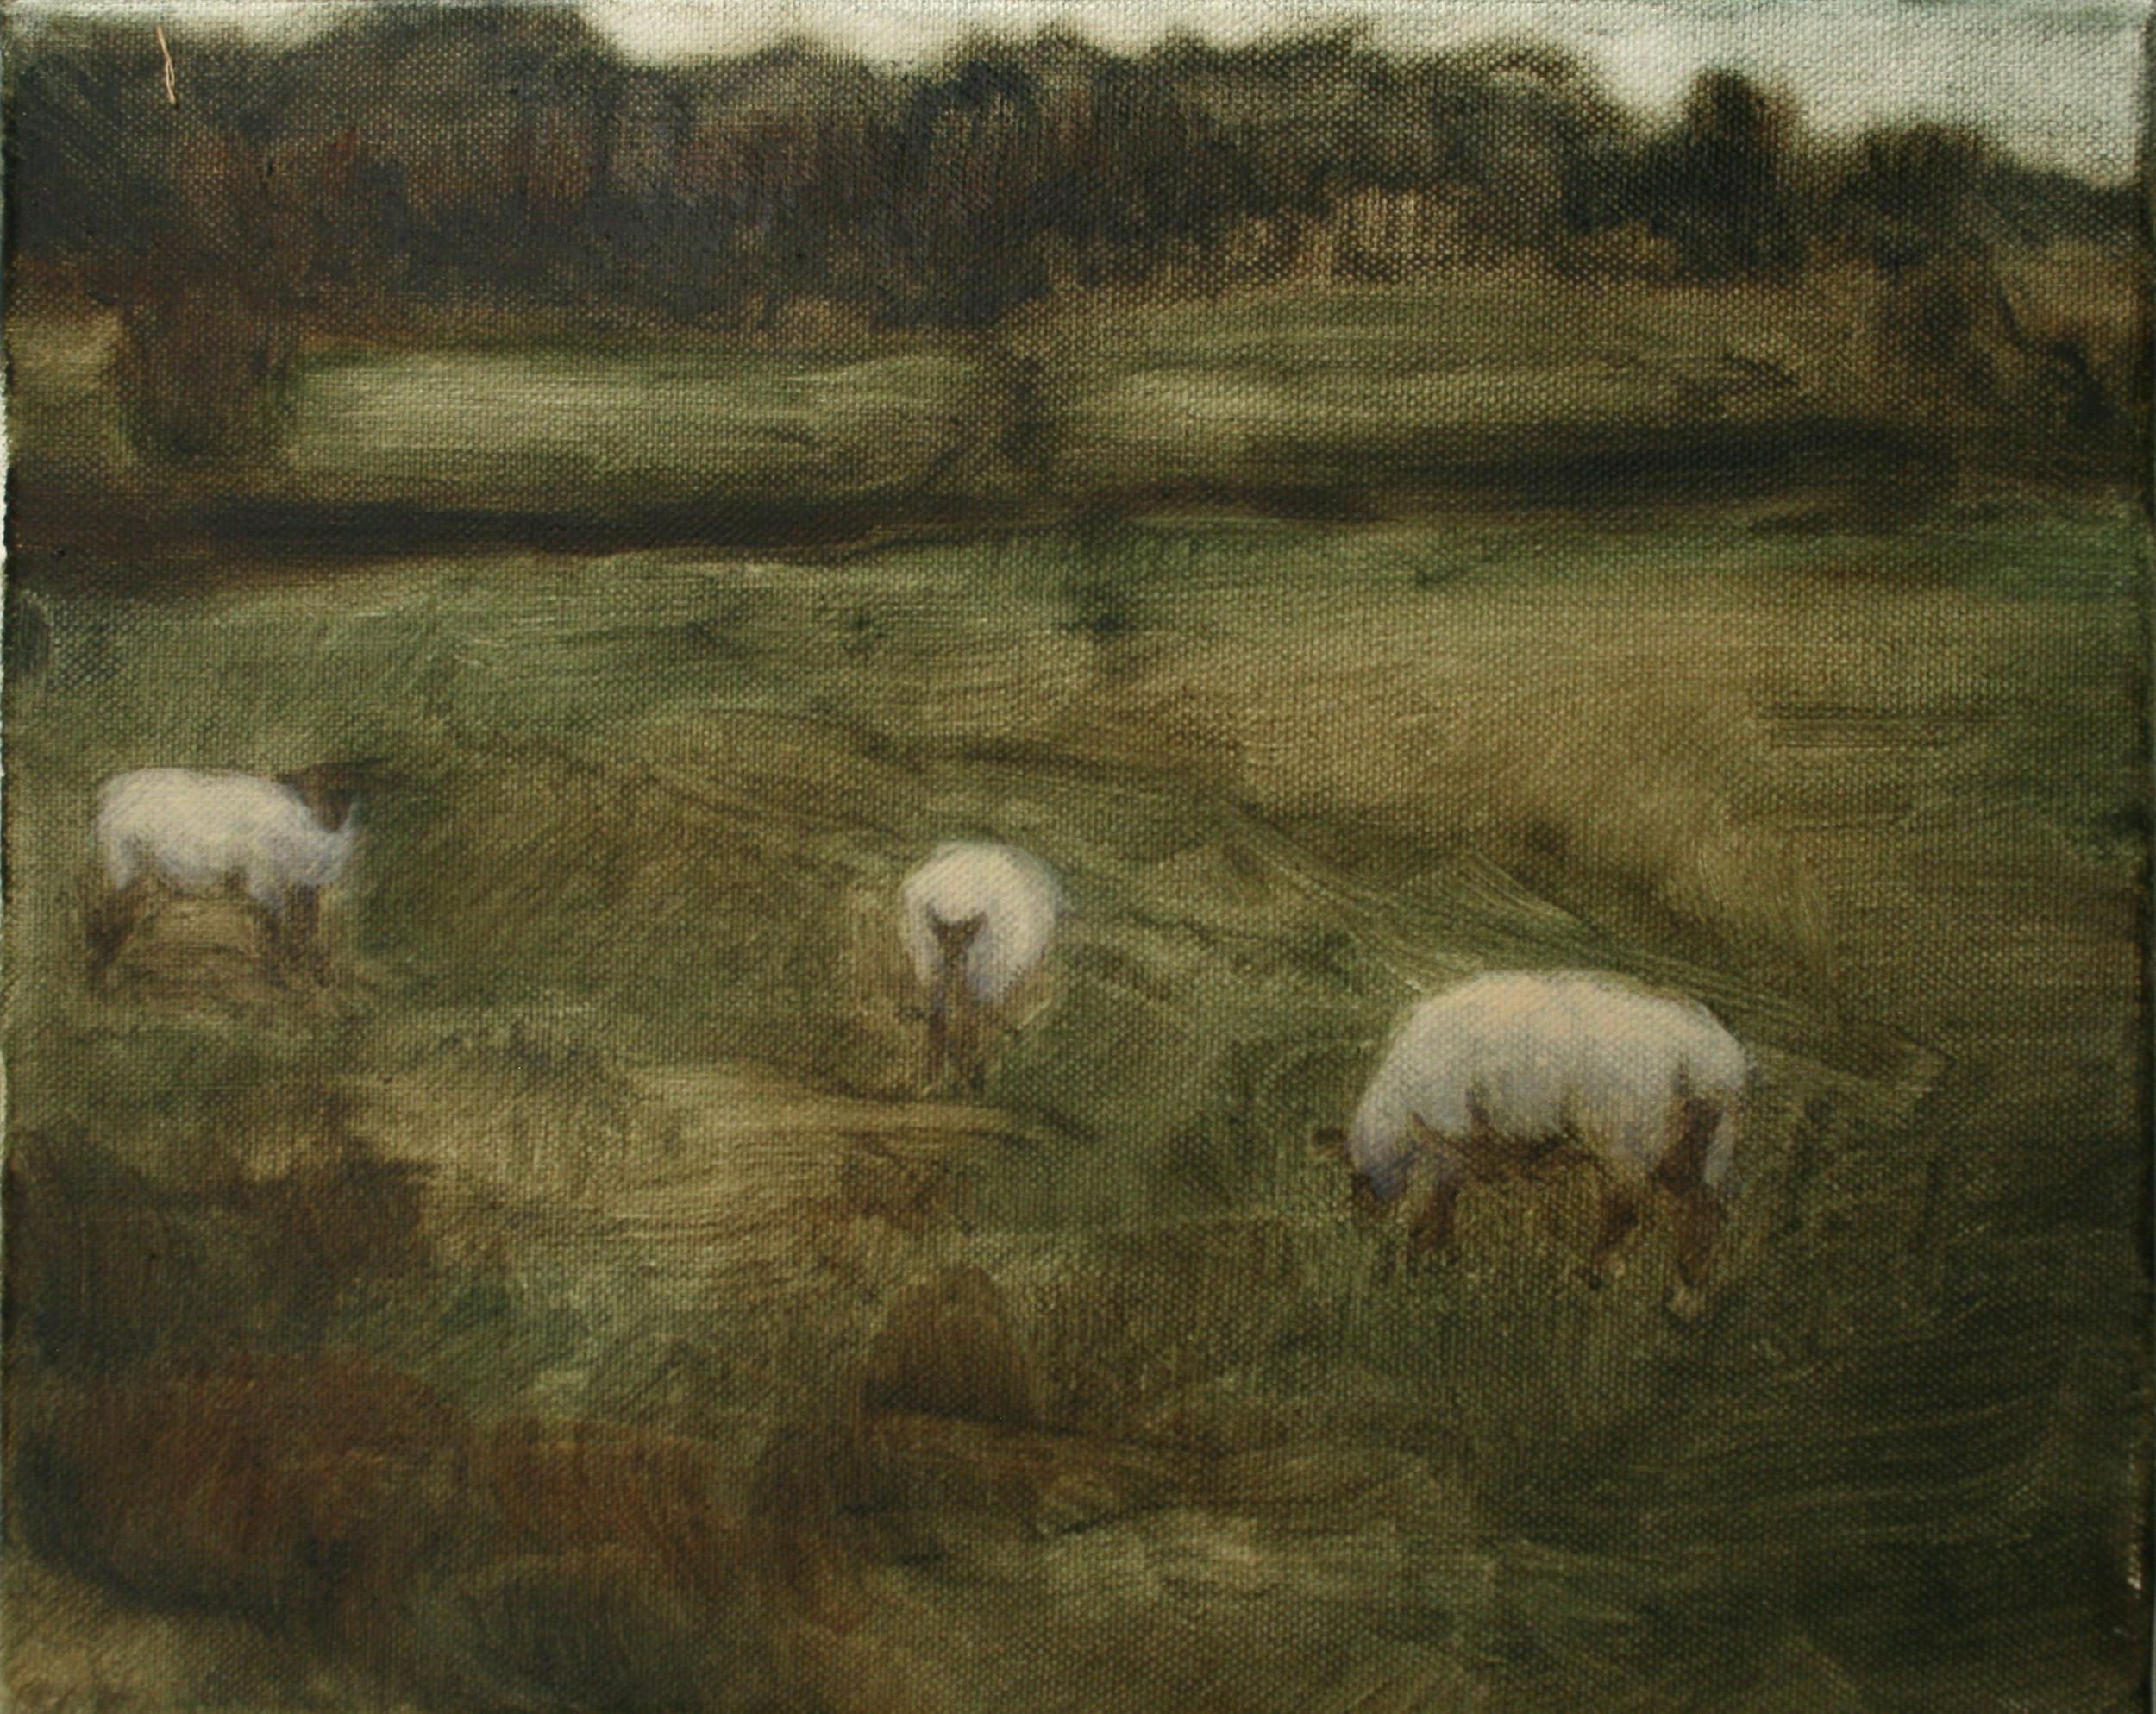 "Sheep Study 7, oil on canvas 30 x 24.5 cm (12"" x 9.5""), 2016"